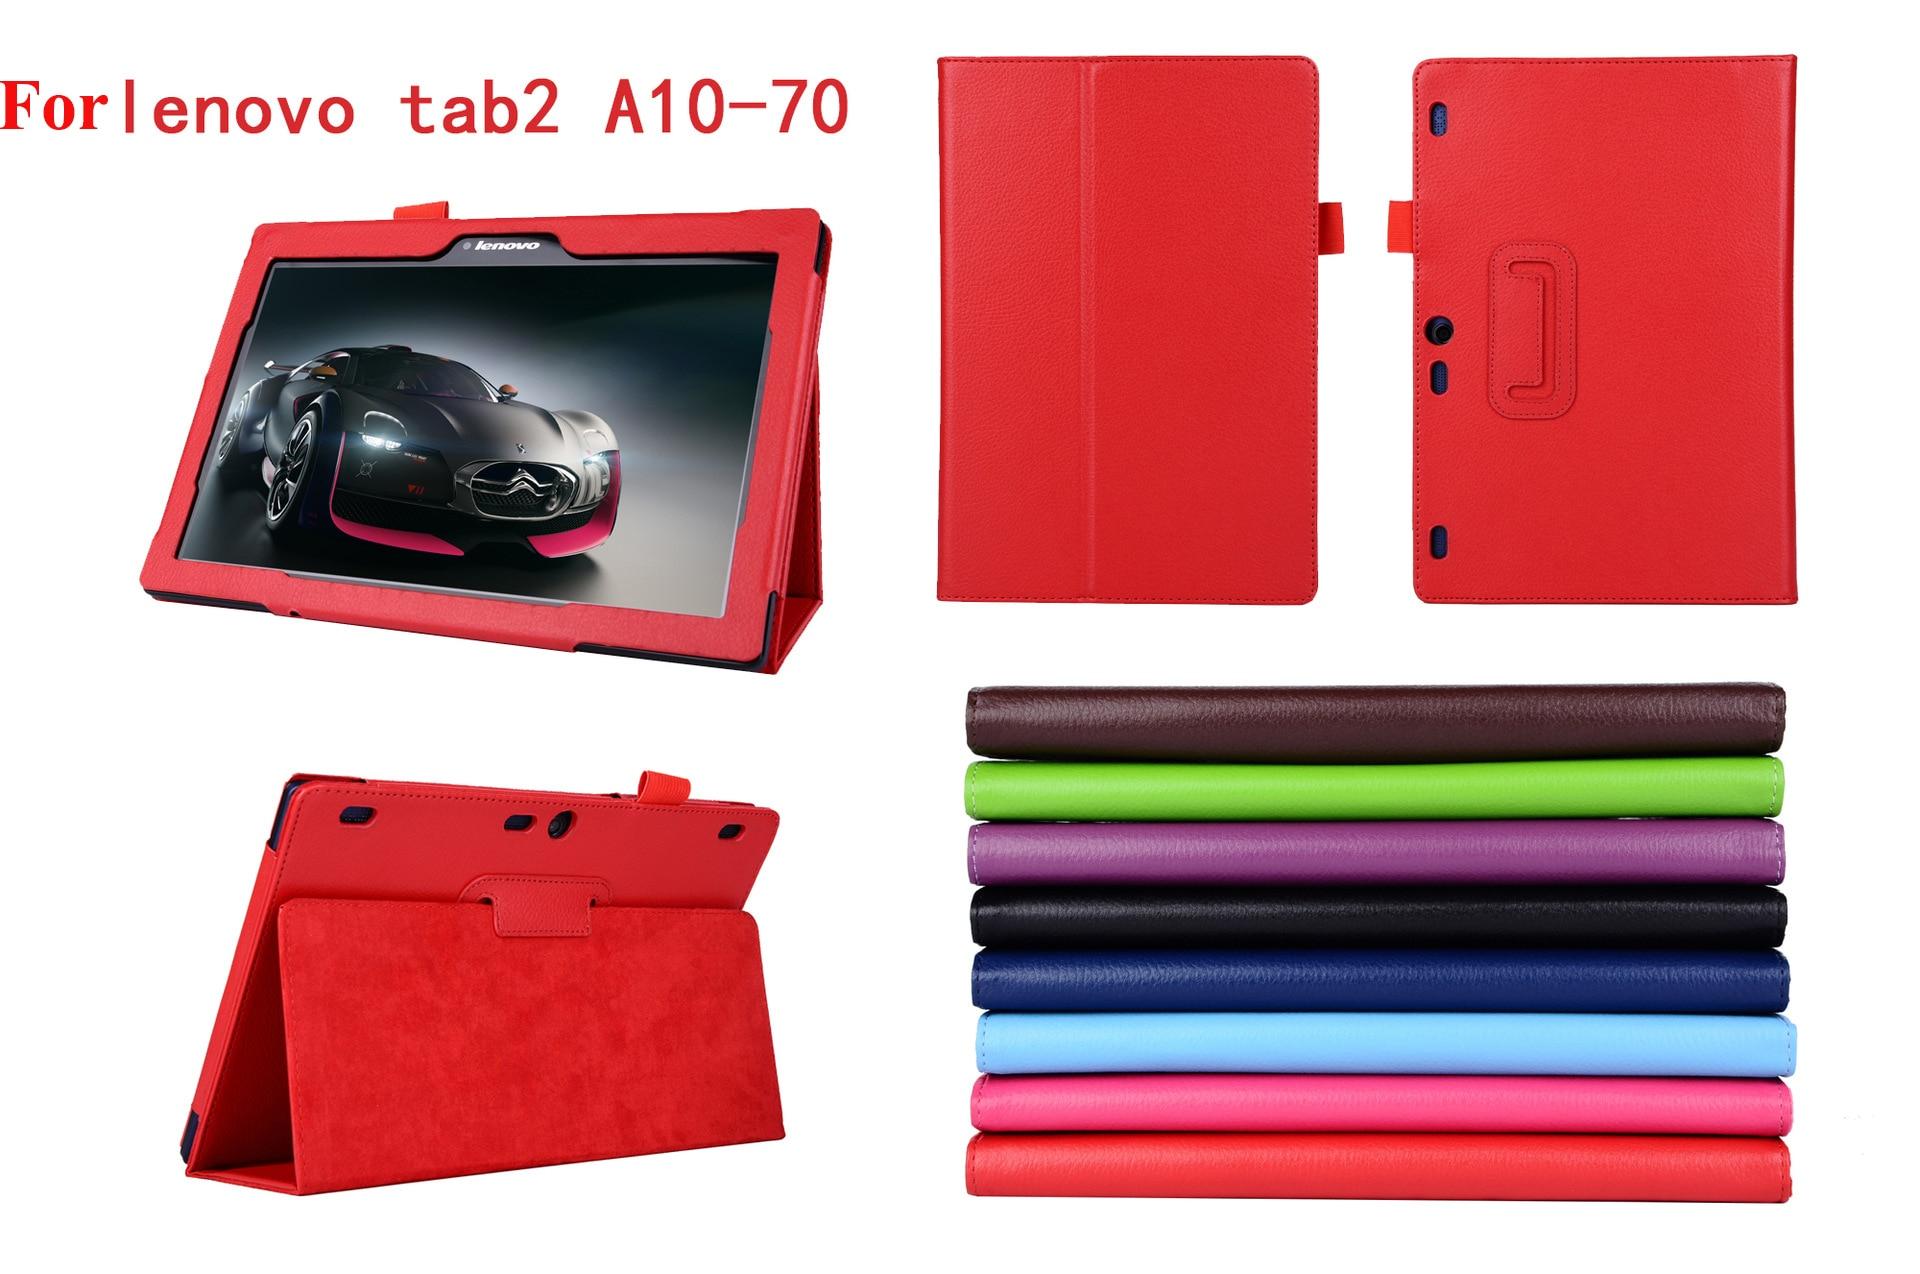 For lenovo Tab2 A10 70 Smart  Flip Leather Tablet Case Cover for Lenovo Tab 2 A10-70 A10-70F A10-70L tablet 10.1'' Tablet Case